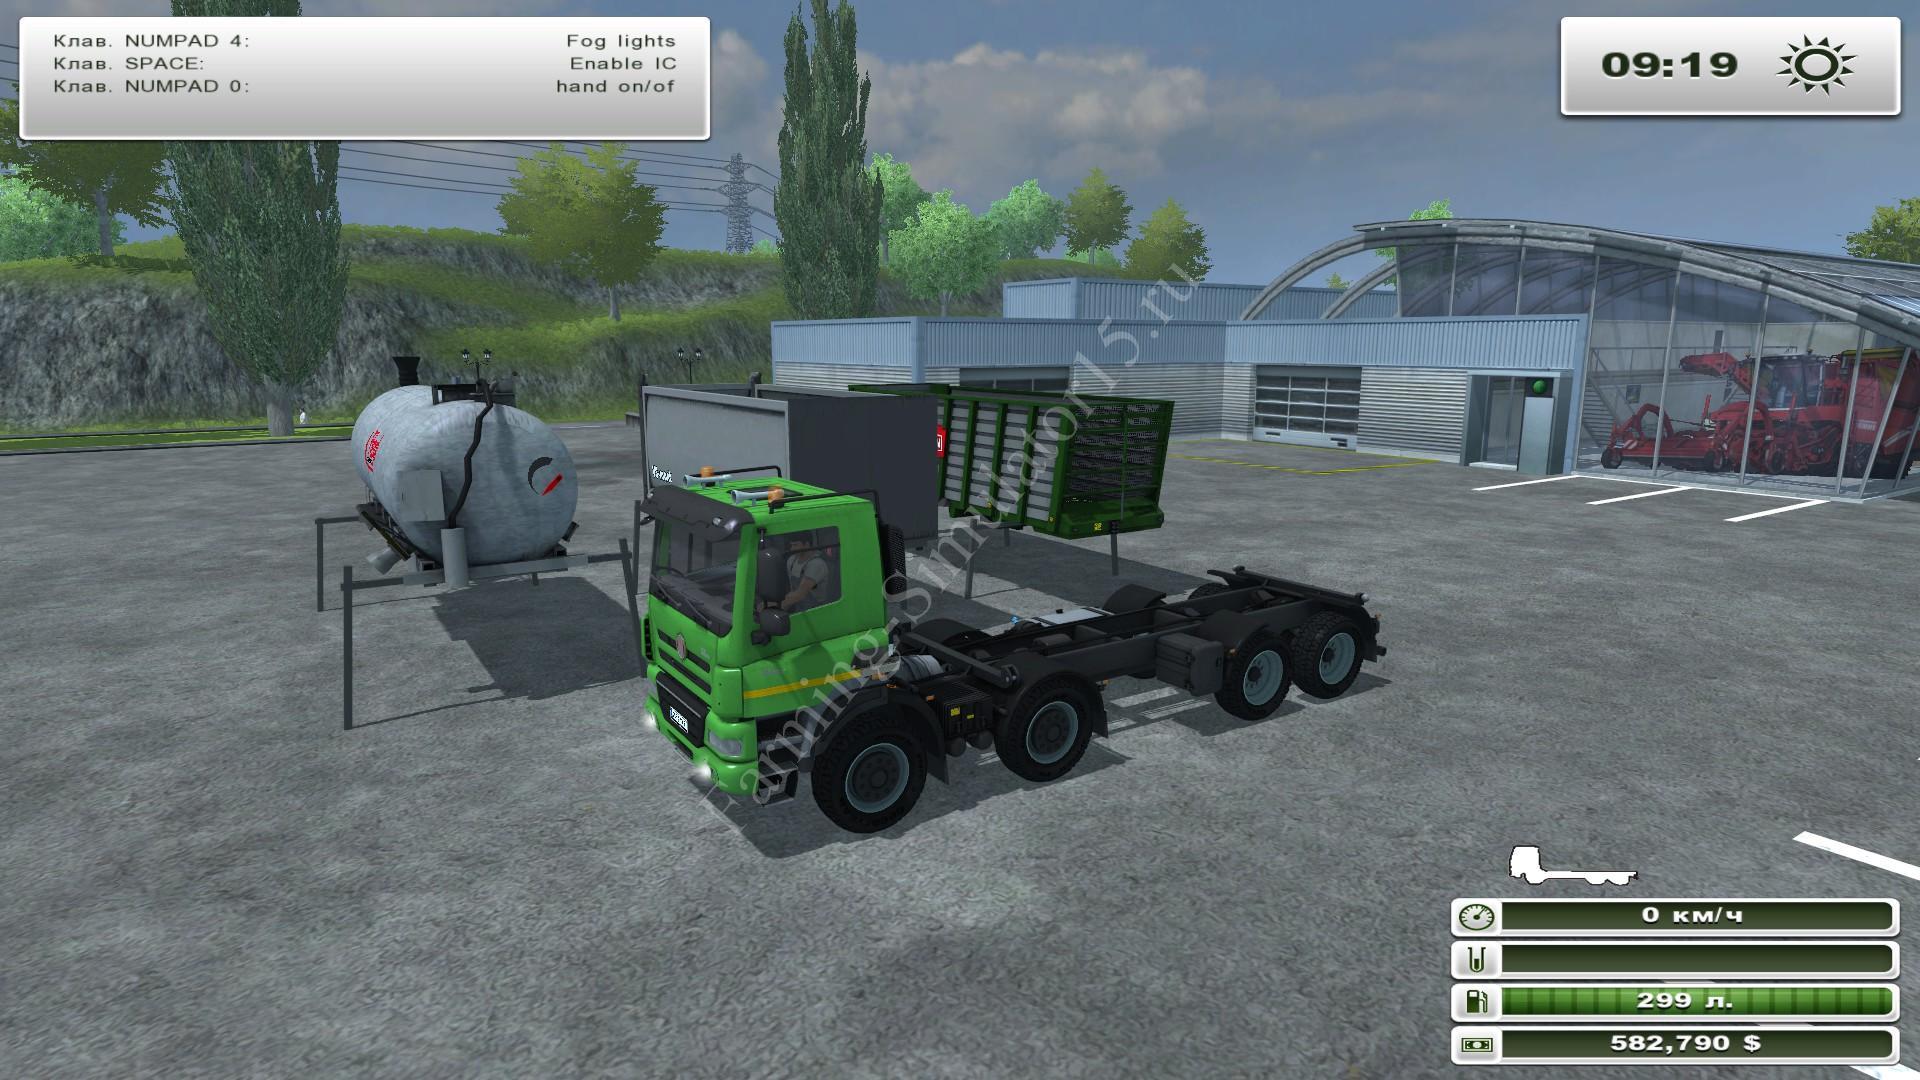 Мод грузовика TATRA 158 8x8 Phoenix Agro v 1.3 Farming Simulator 2013, Farming Simulator 13